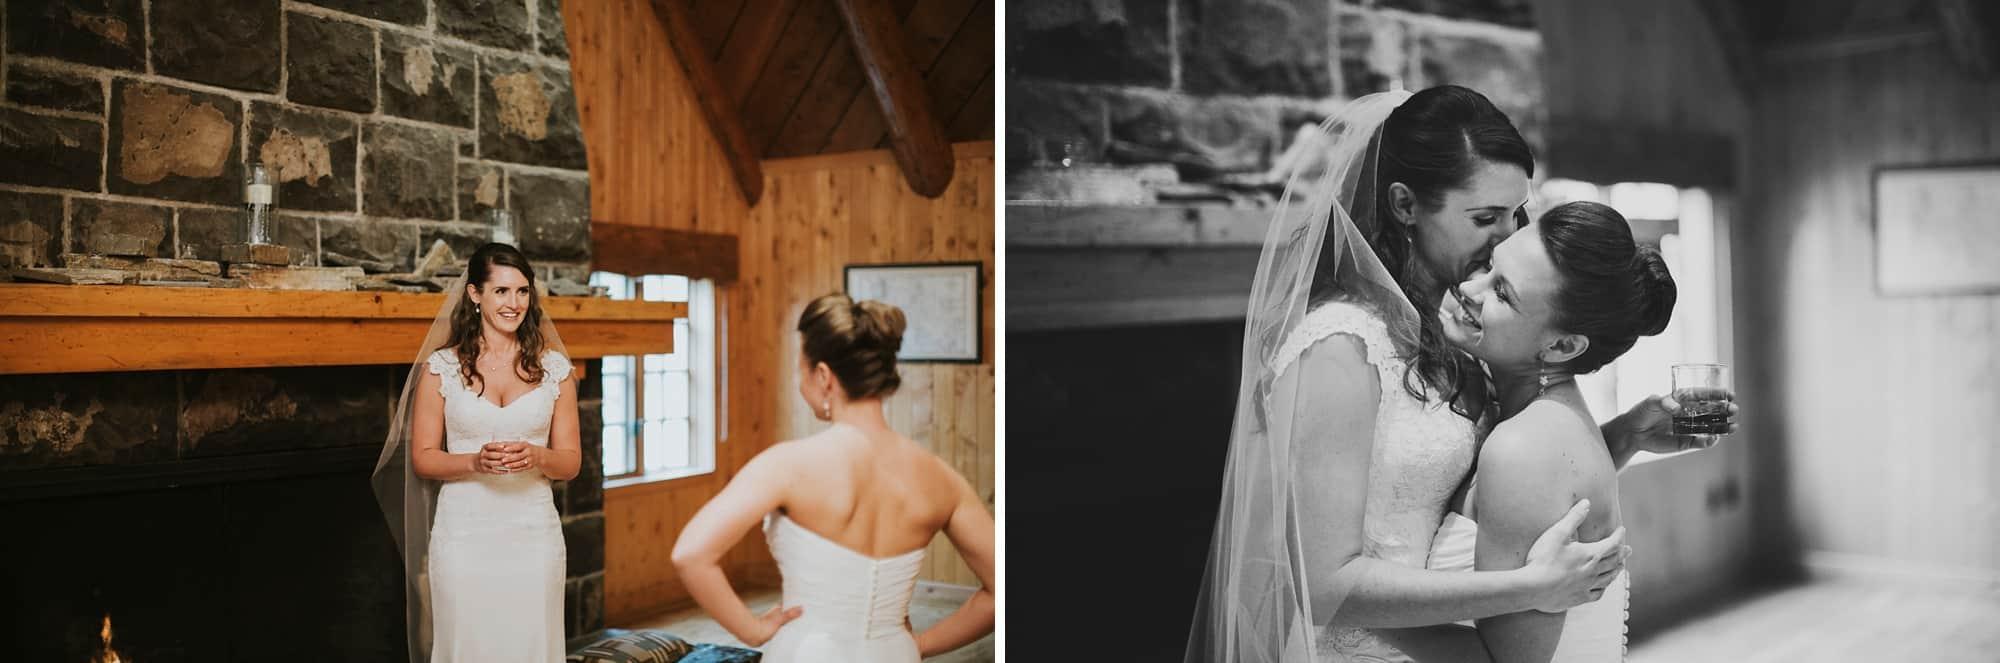 Sara Emily Sunriver Bend Oregon Rustic Lodge Wedding 0050